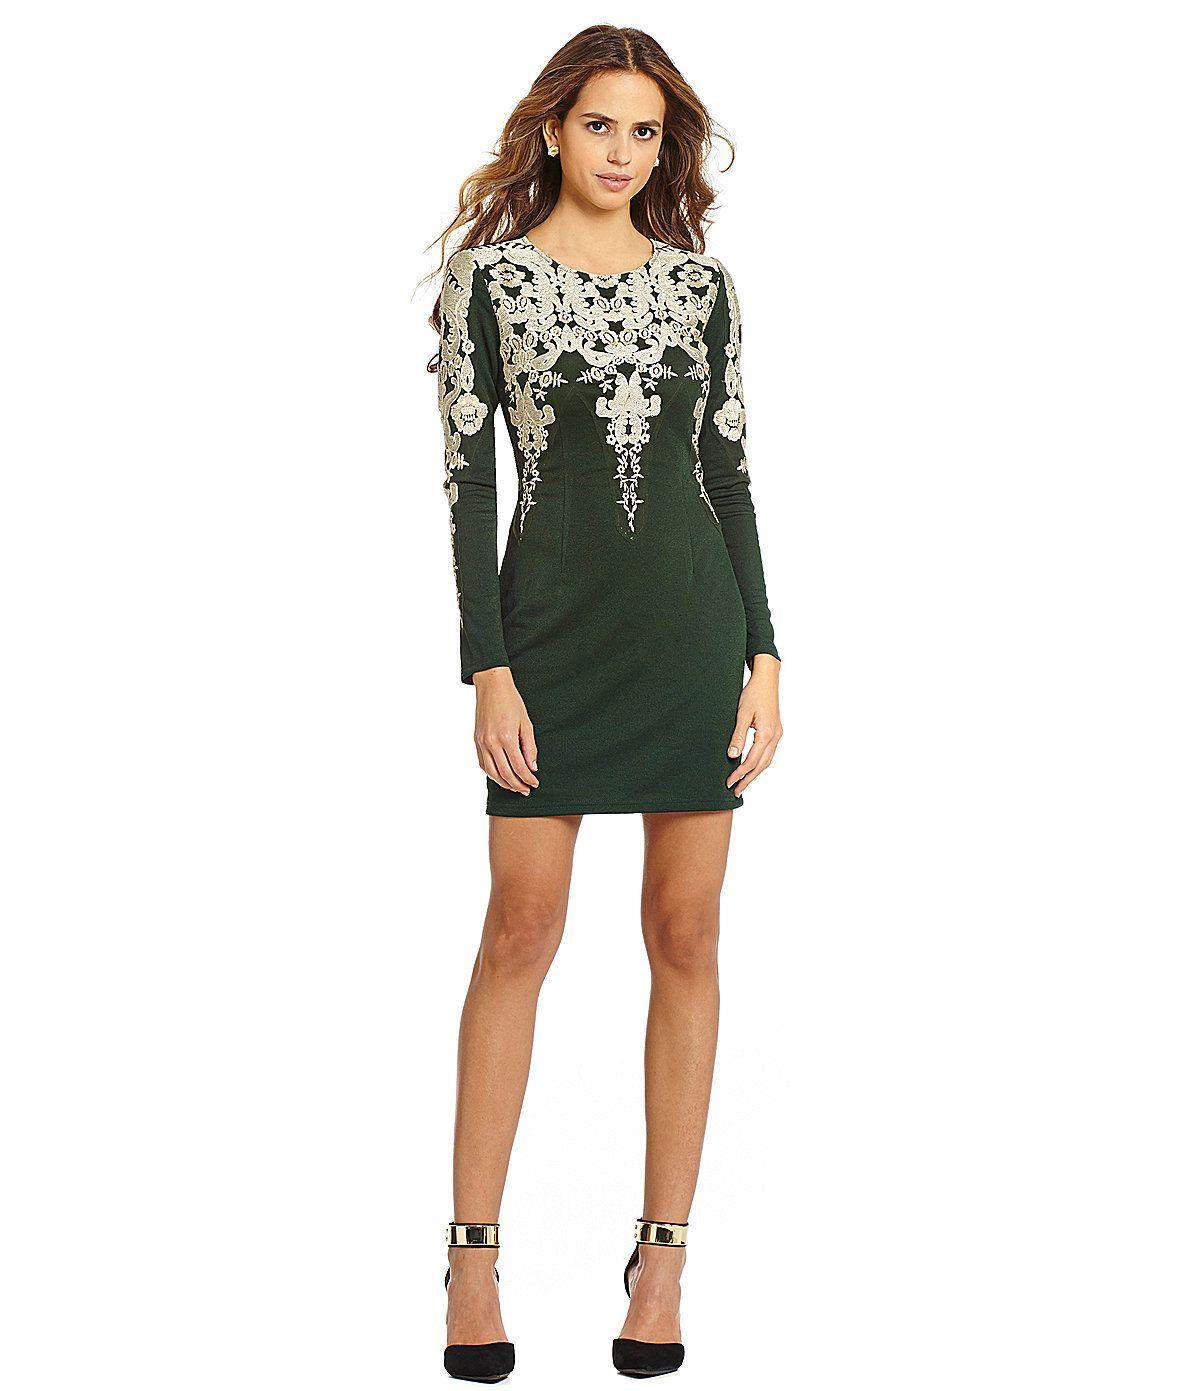 Gianni bini fan fav jollie embroidered lace dress dillards gianni bini fan fav jollie embroidered lace dress dillards ombrellifo Gallery